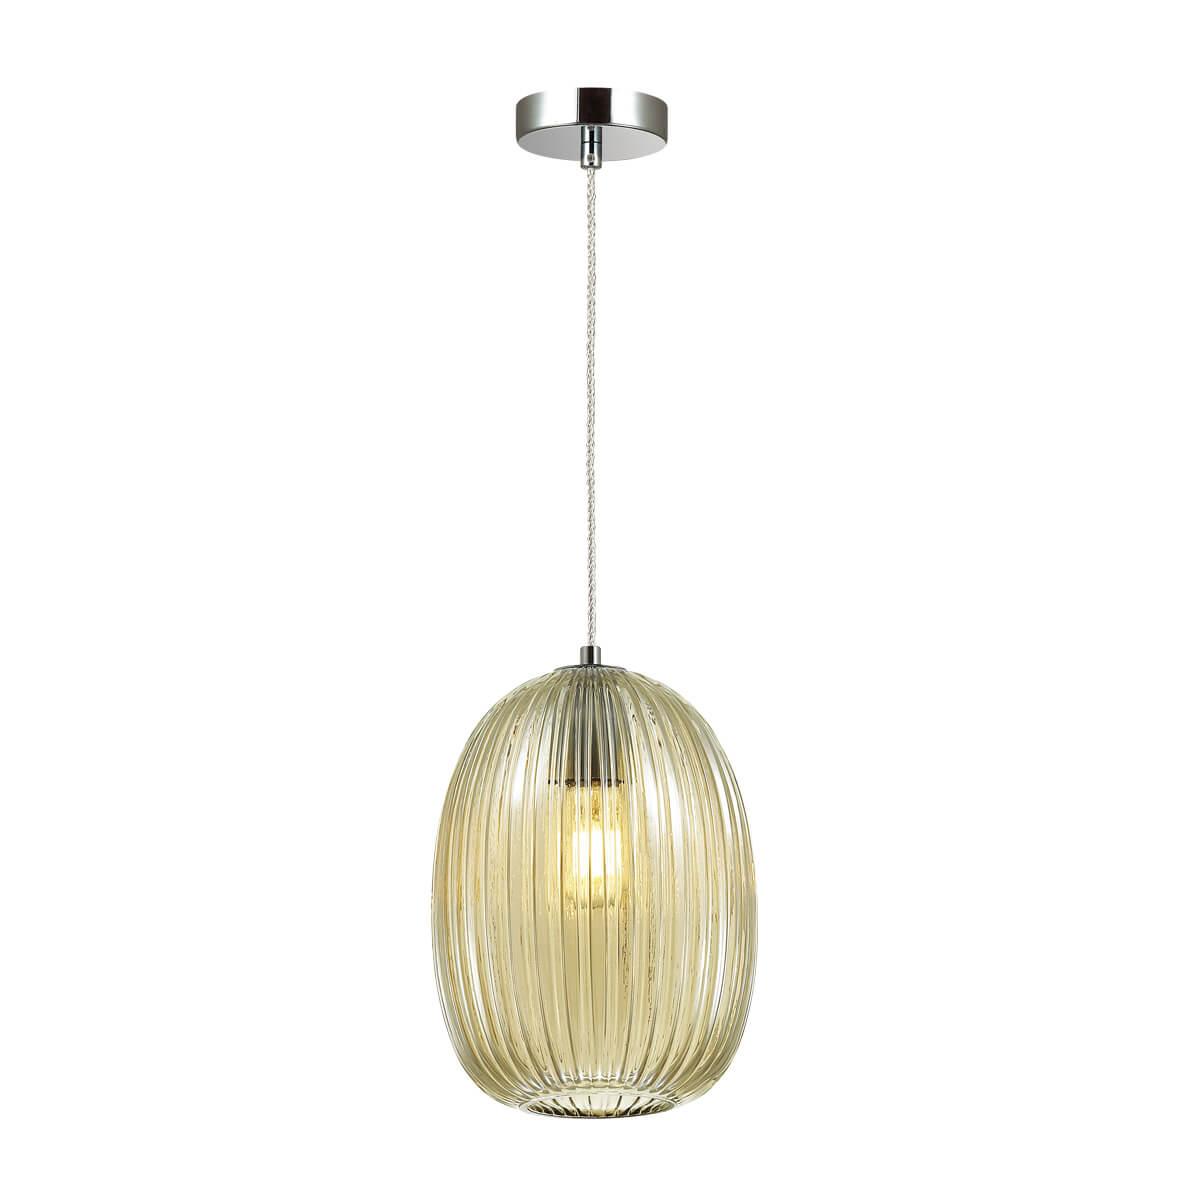 Светильник Odeon Light 4703/1 Pendant светильник odeon light 4702 1 dori